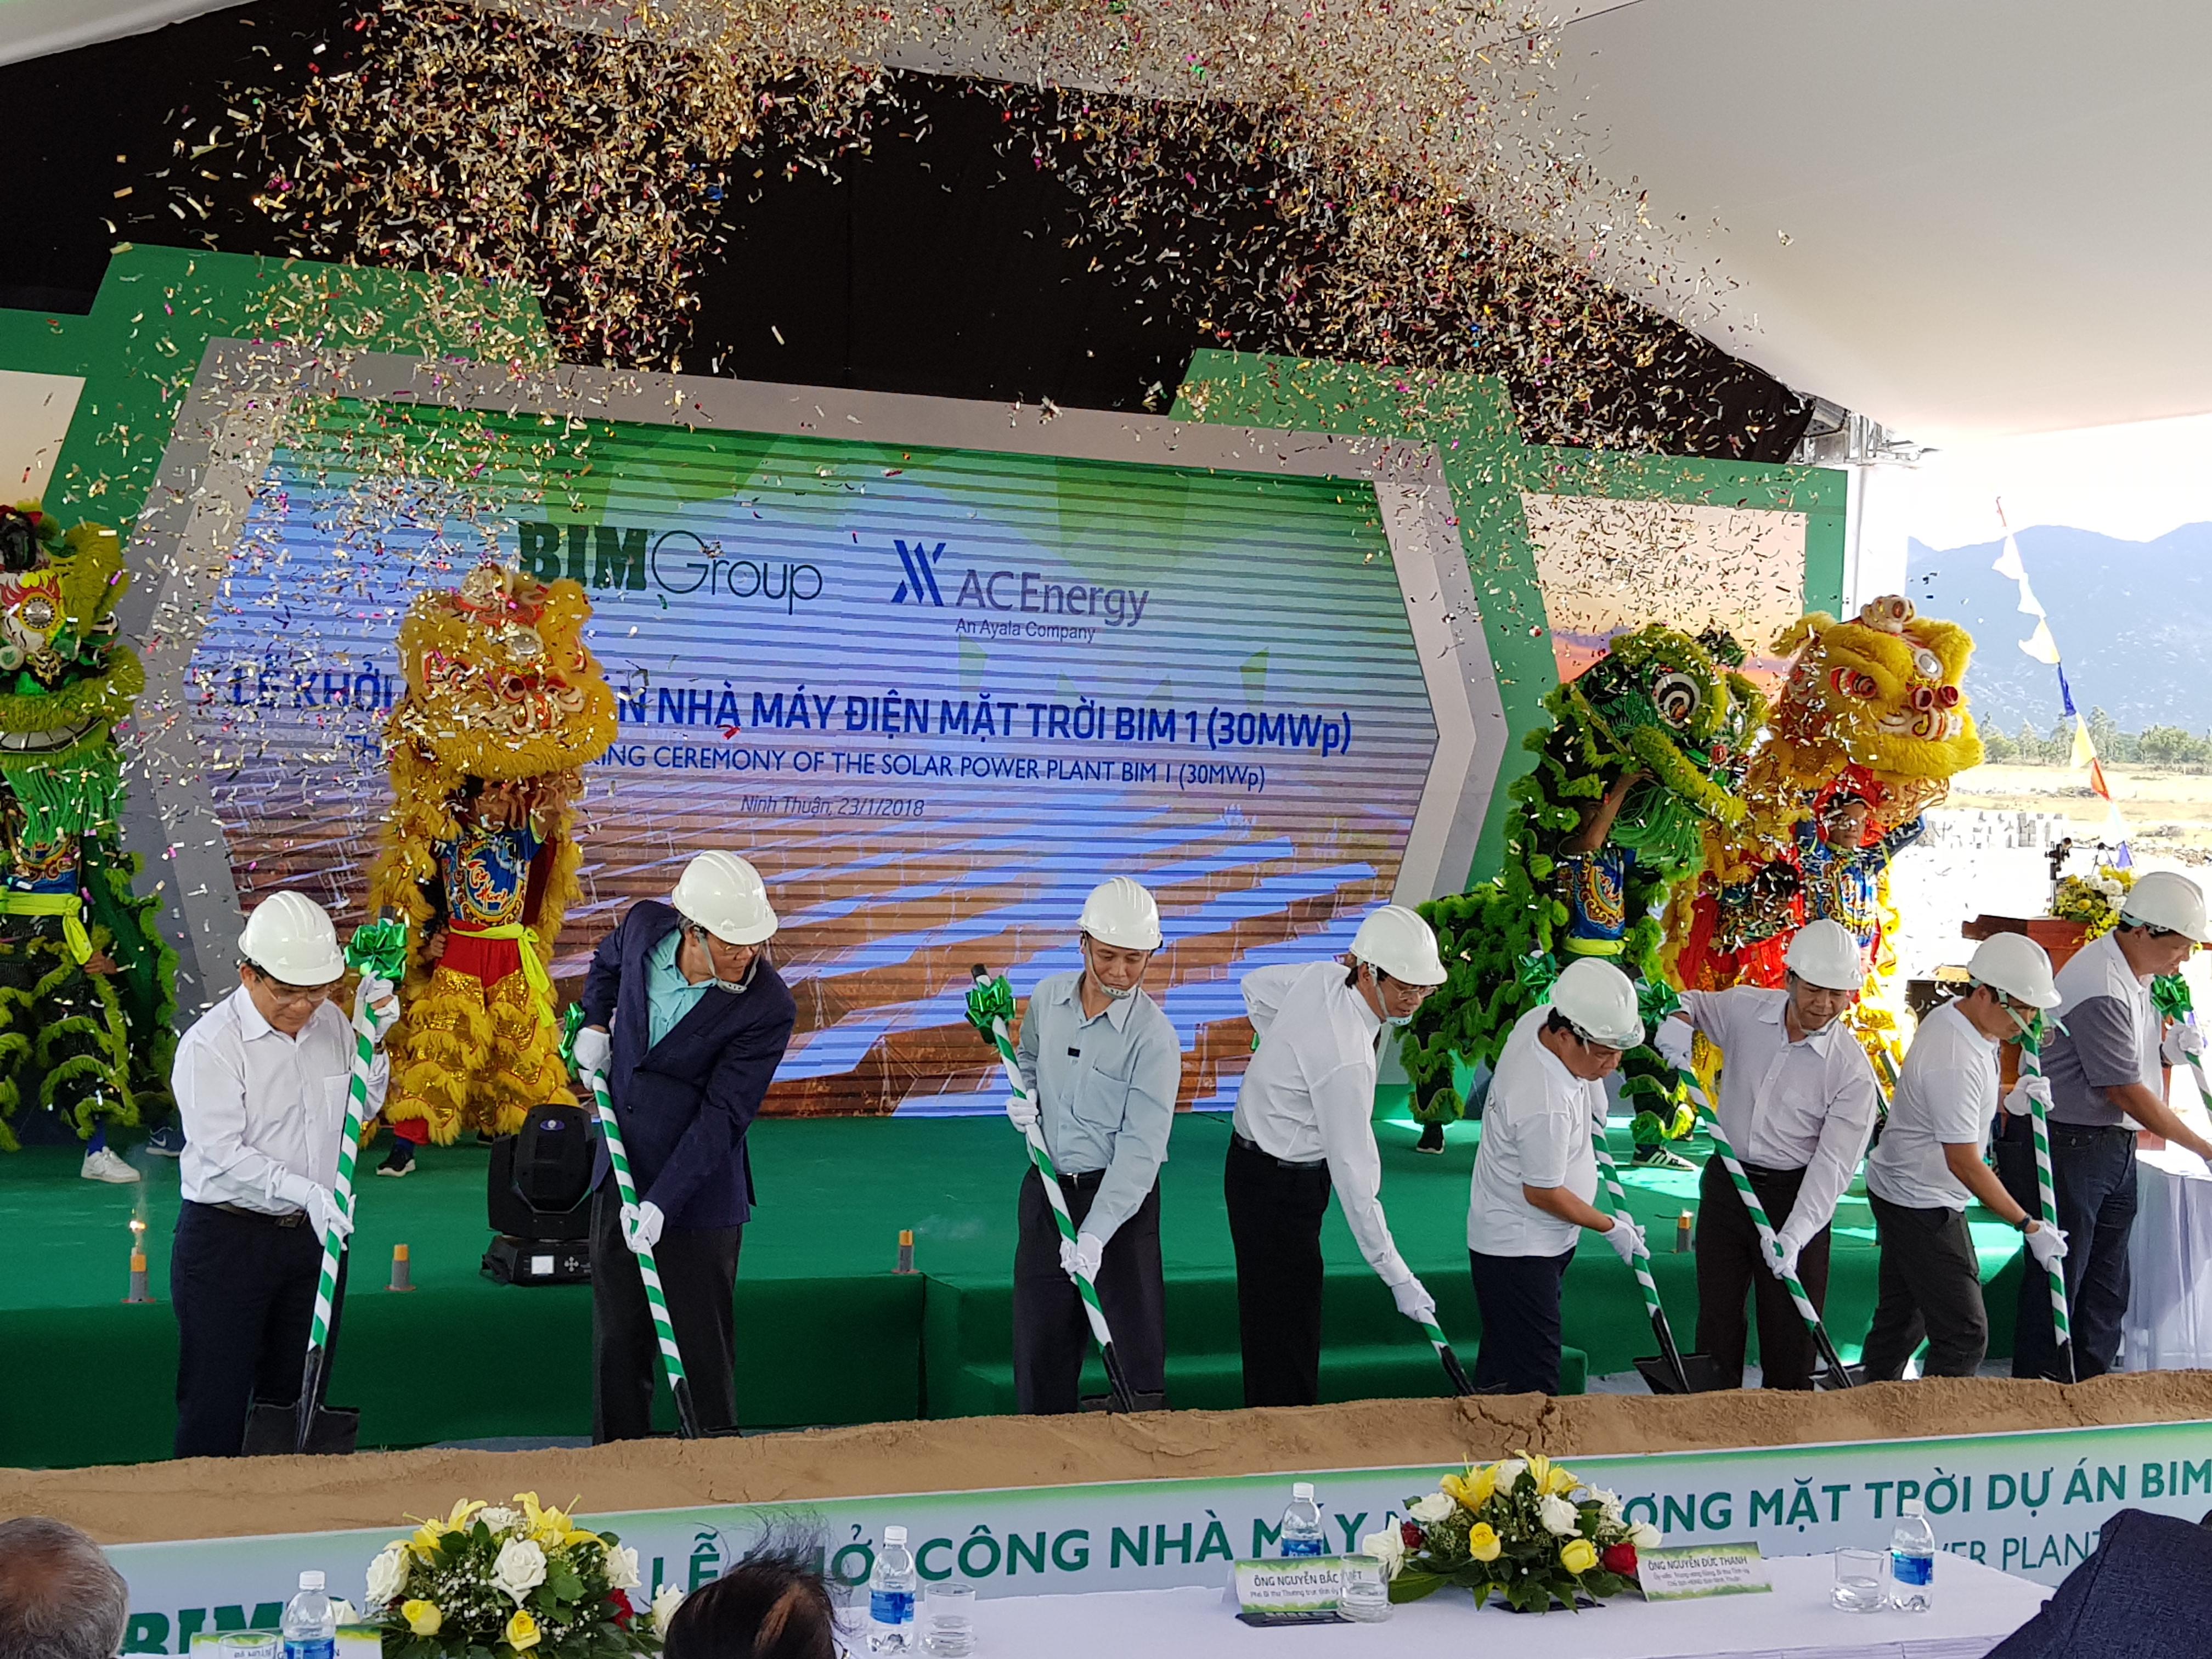 bim group kicks off 35 million solar power project in ninh thuan